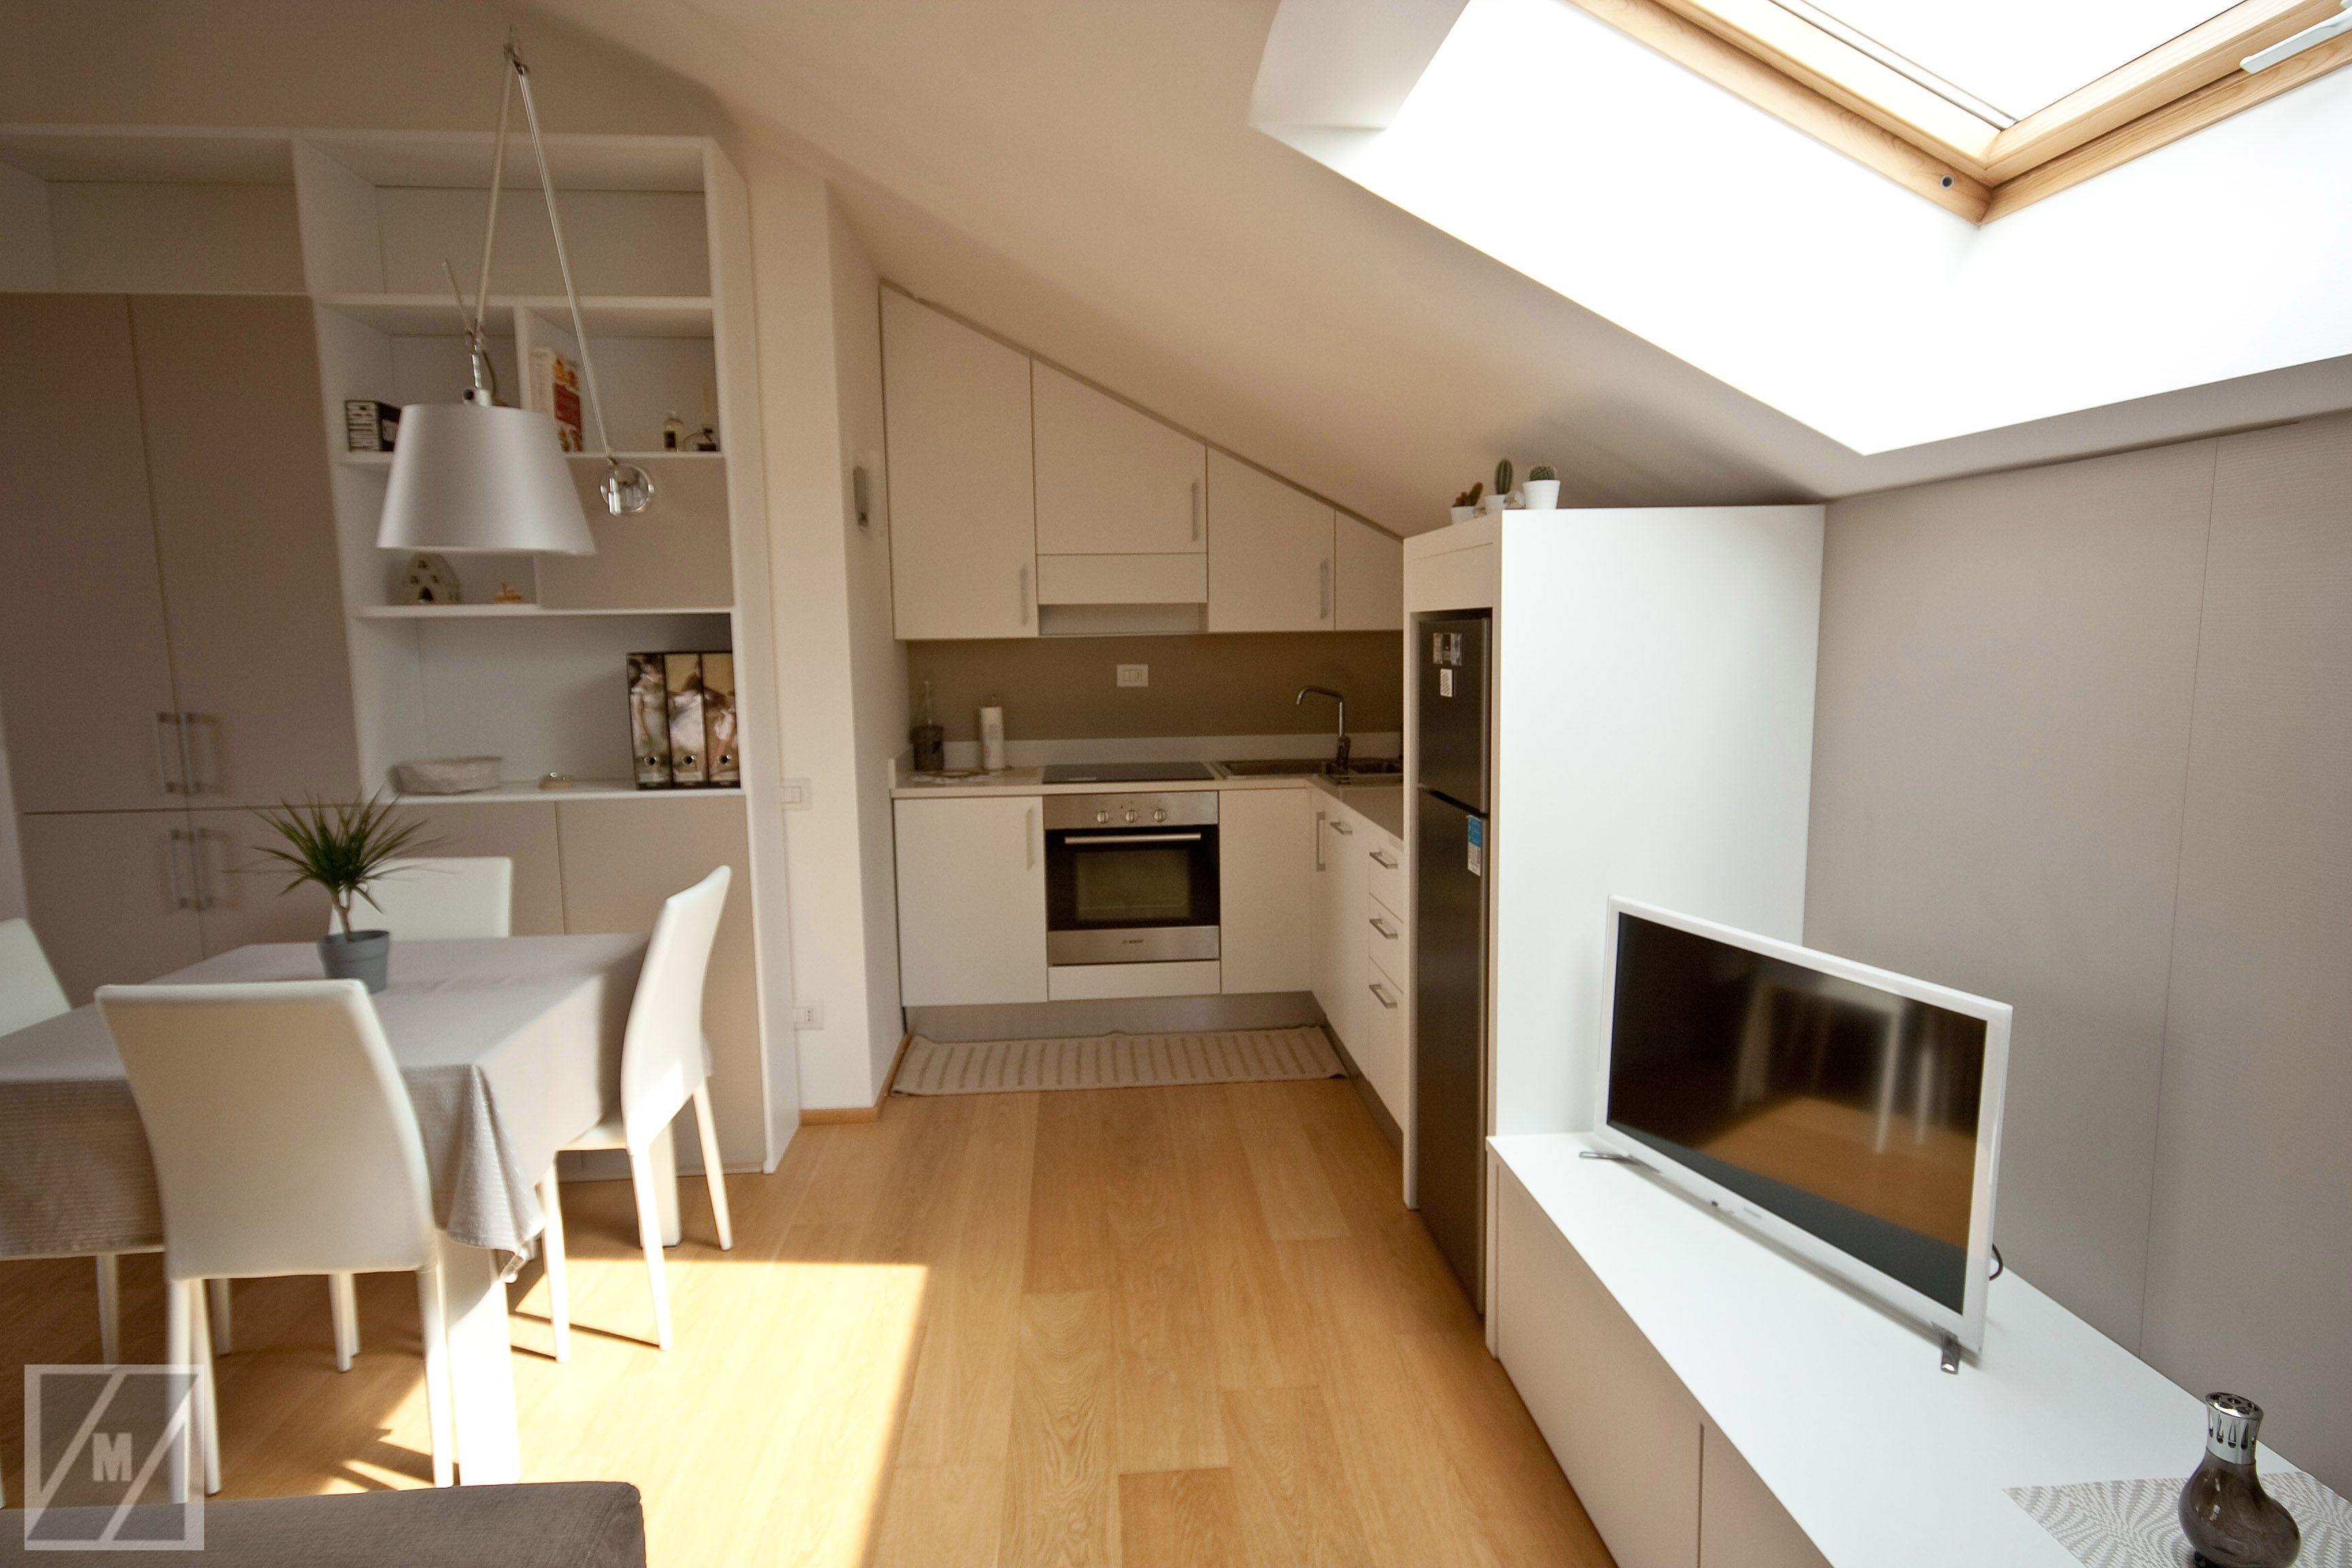 Cucina e living in mansarda arredamento mansarde nel for Rollandi arredamenti